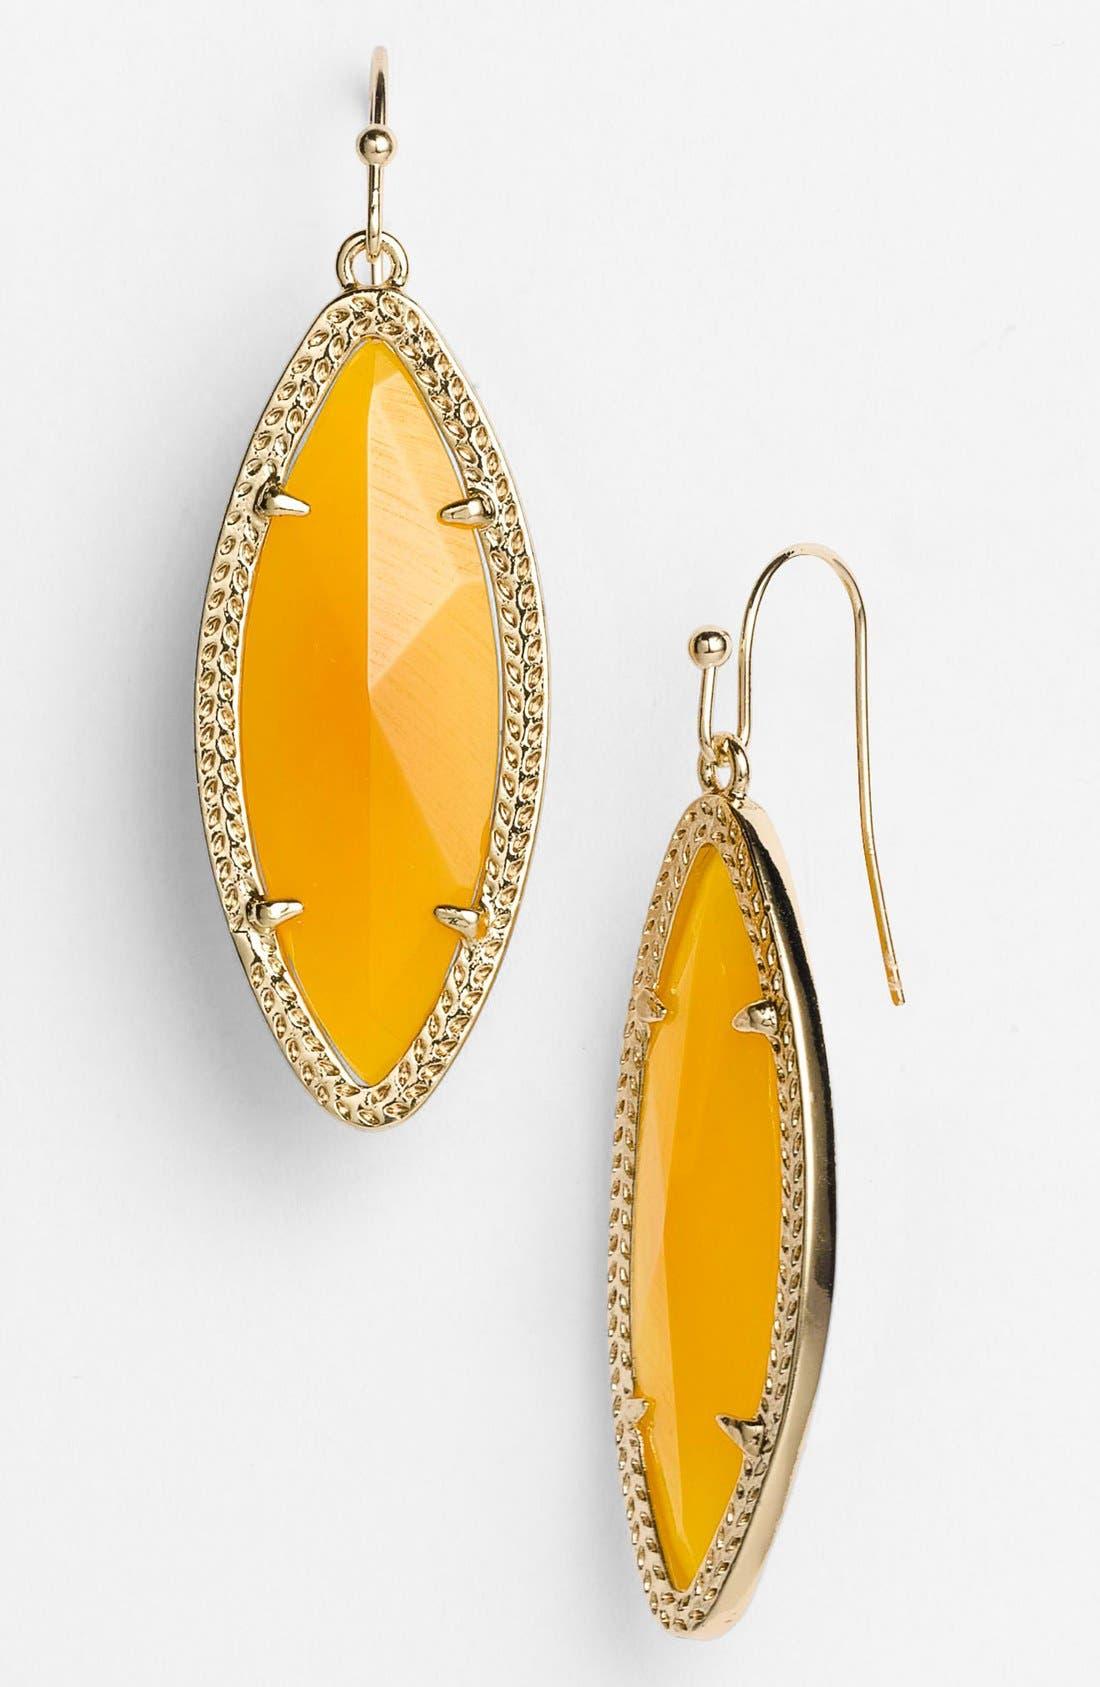 Main Image - Kendra Scott 'Dora' Stone Drop Earrings (Nordstrom Exclusive)